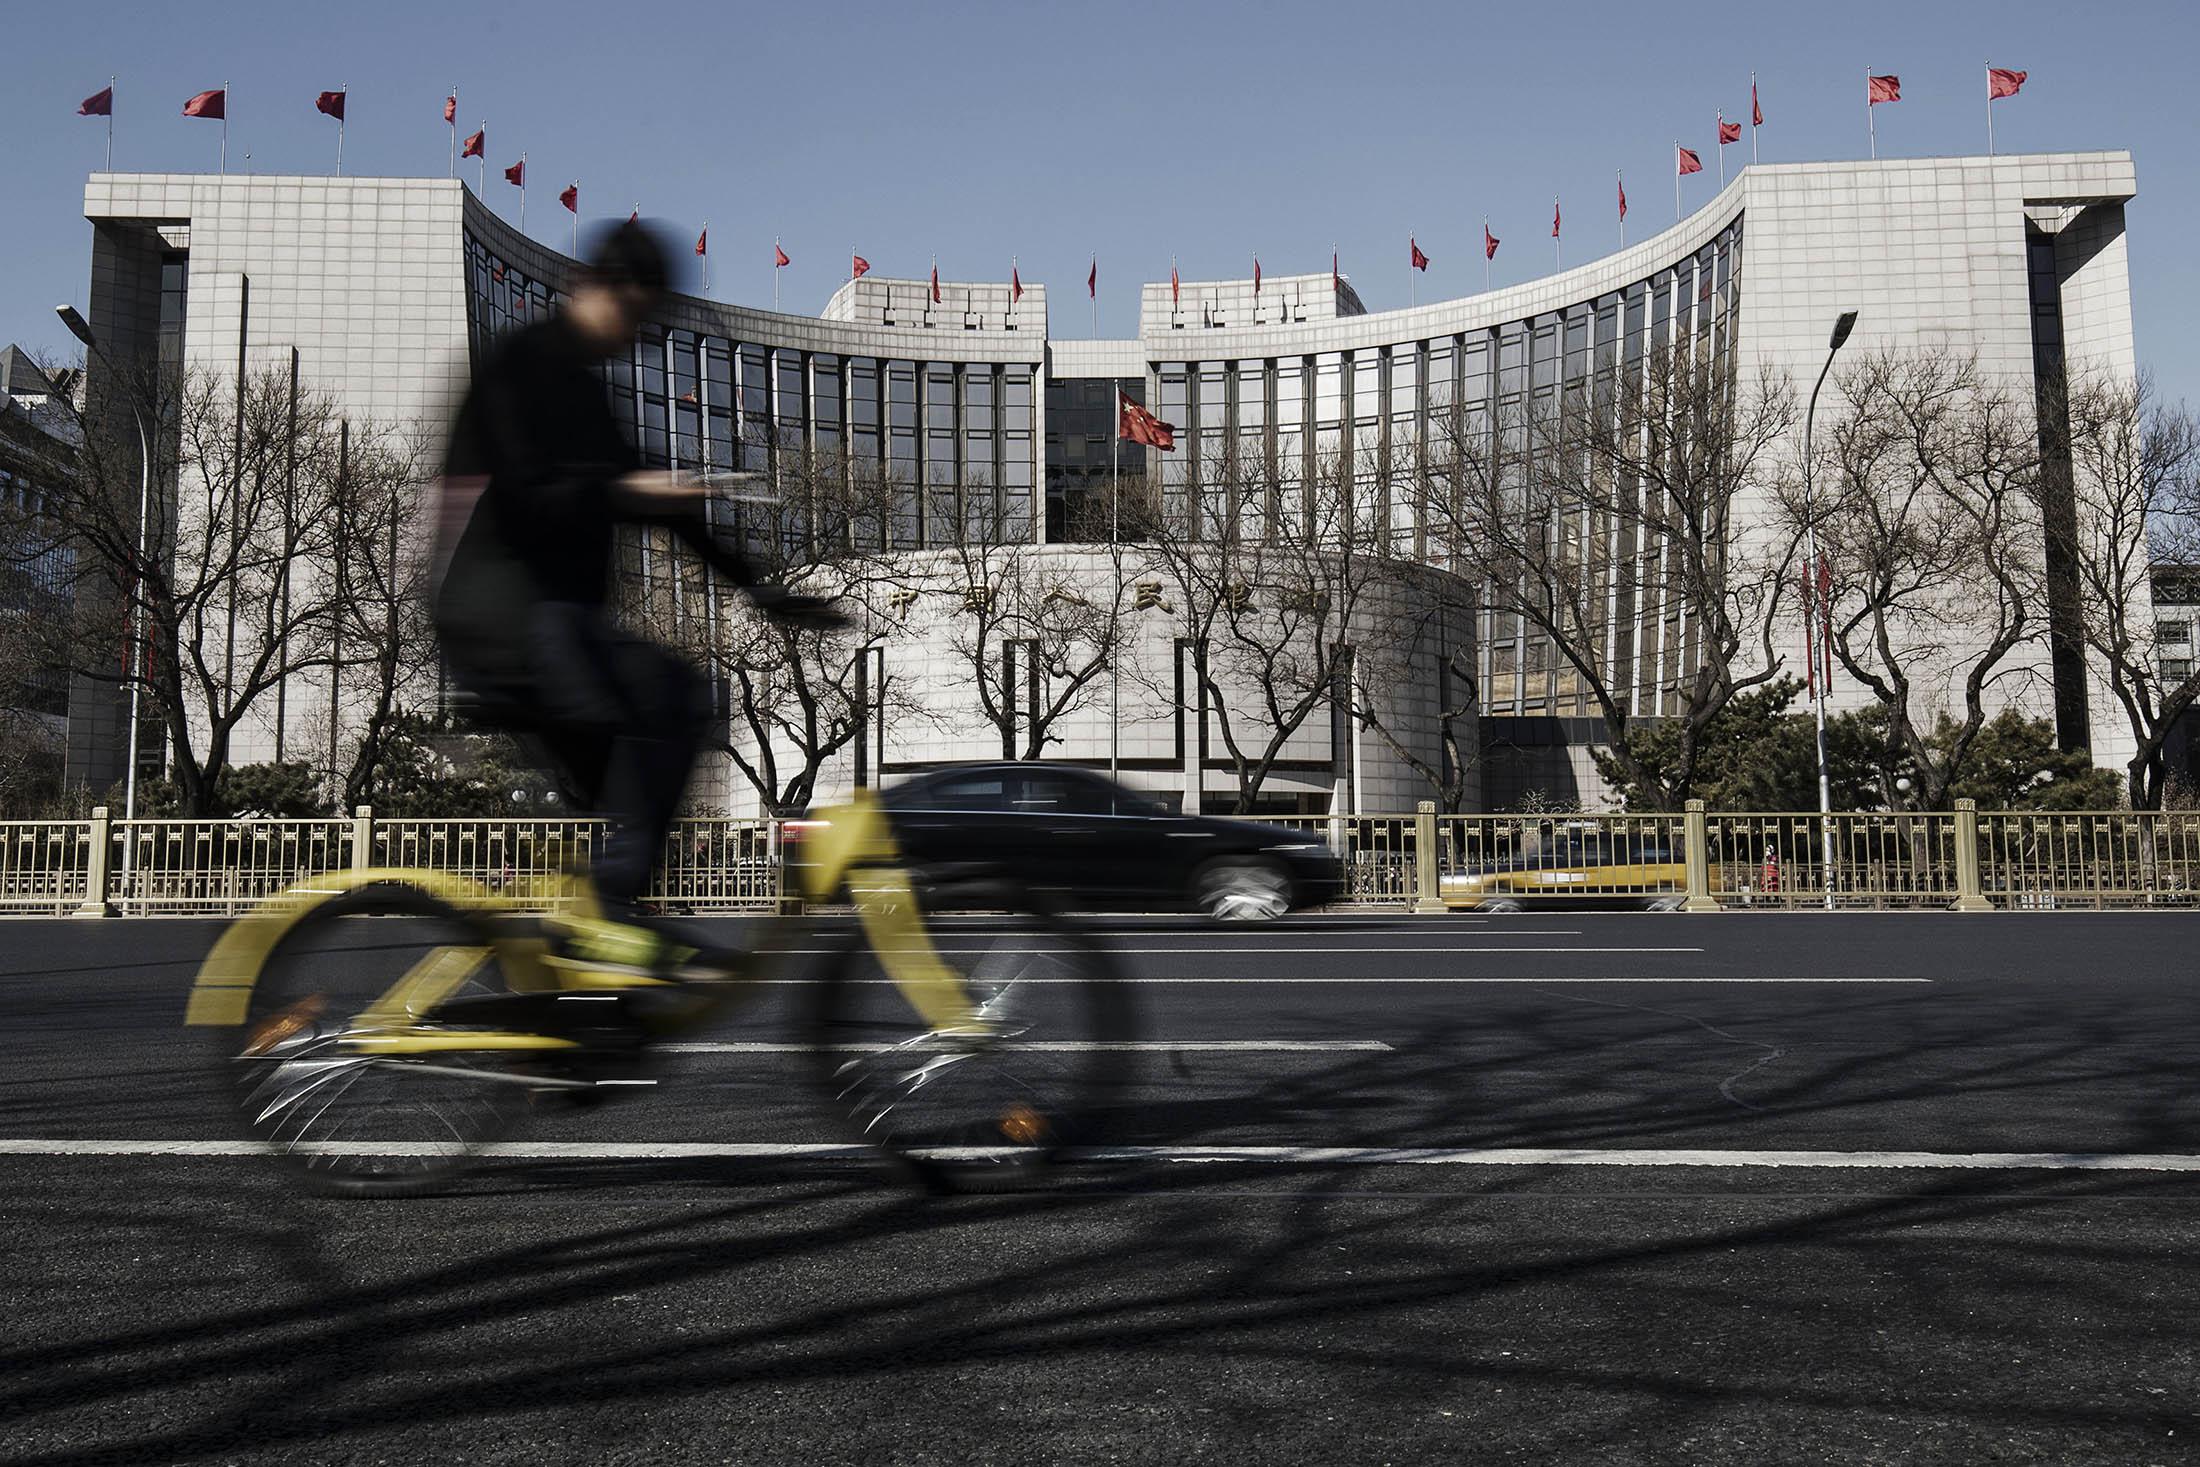 bloomberg.com - PBOC Braces for the 'Last Mile' in Interest Rates Overhaul